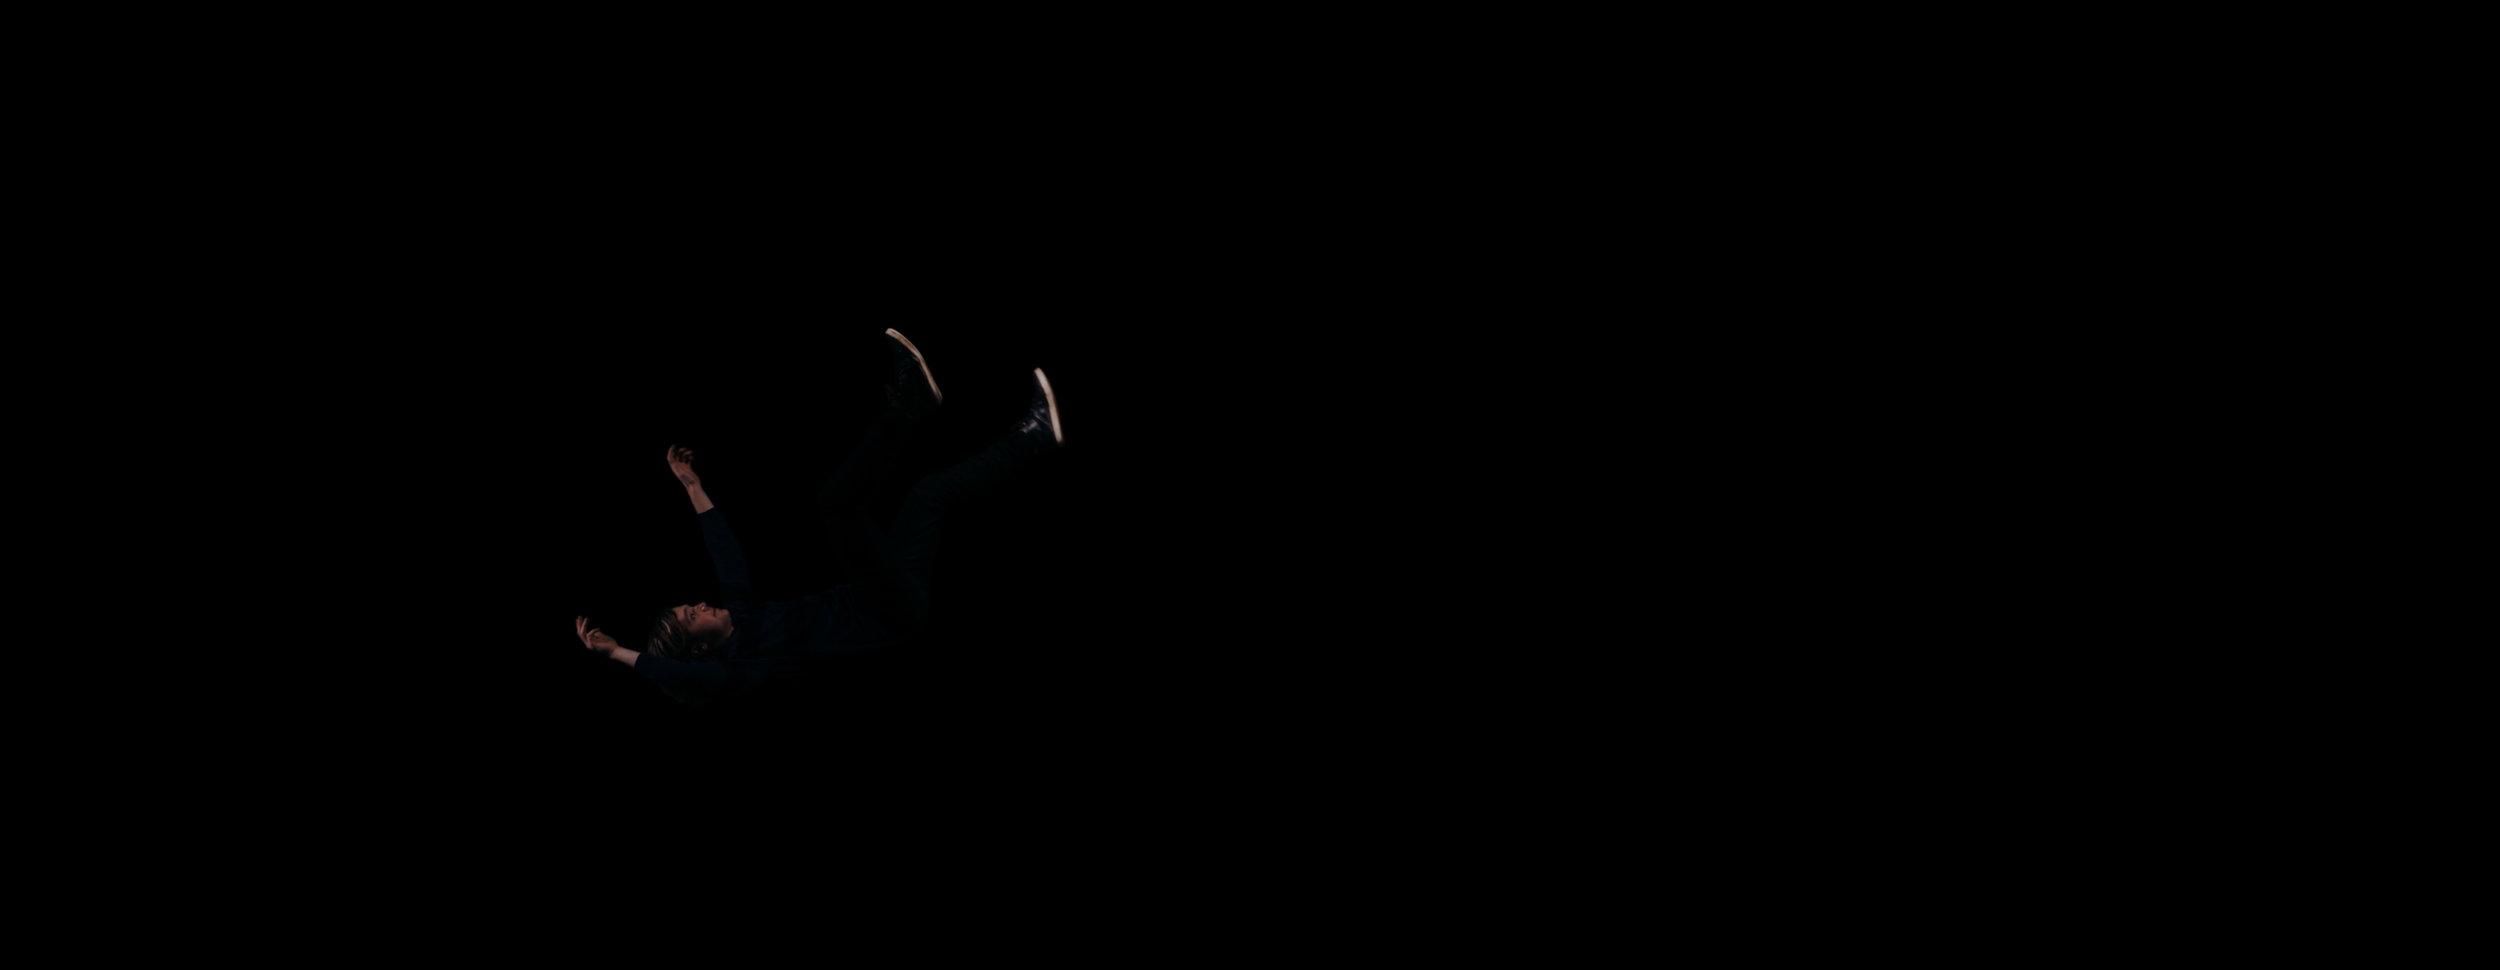 Screen Shot 2017-09-25 at 4.11.40 PM.jpg